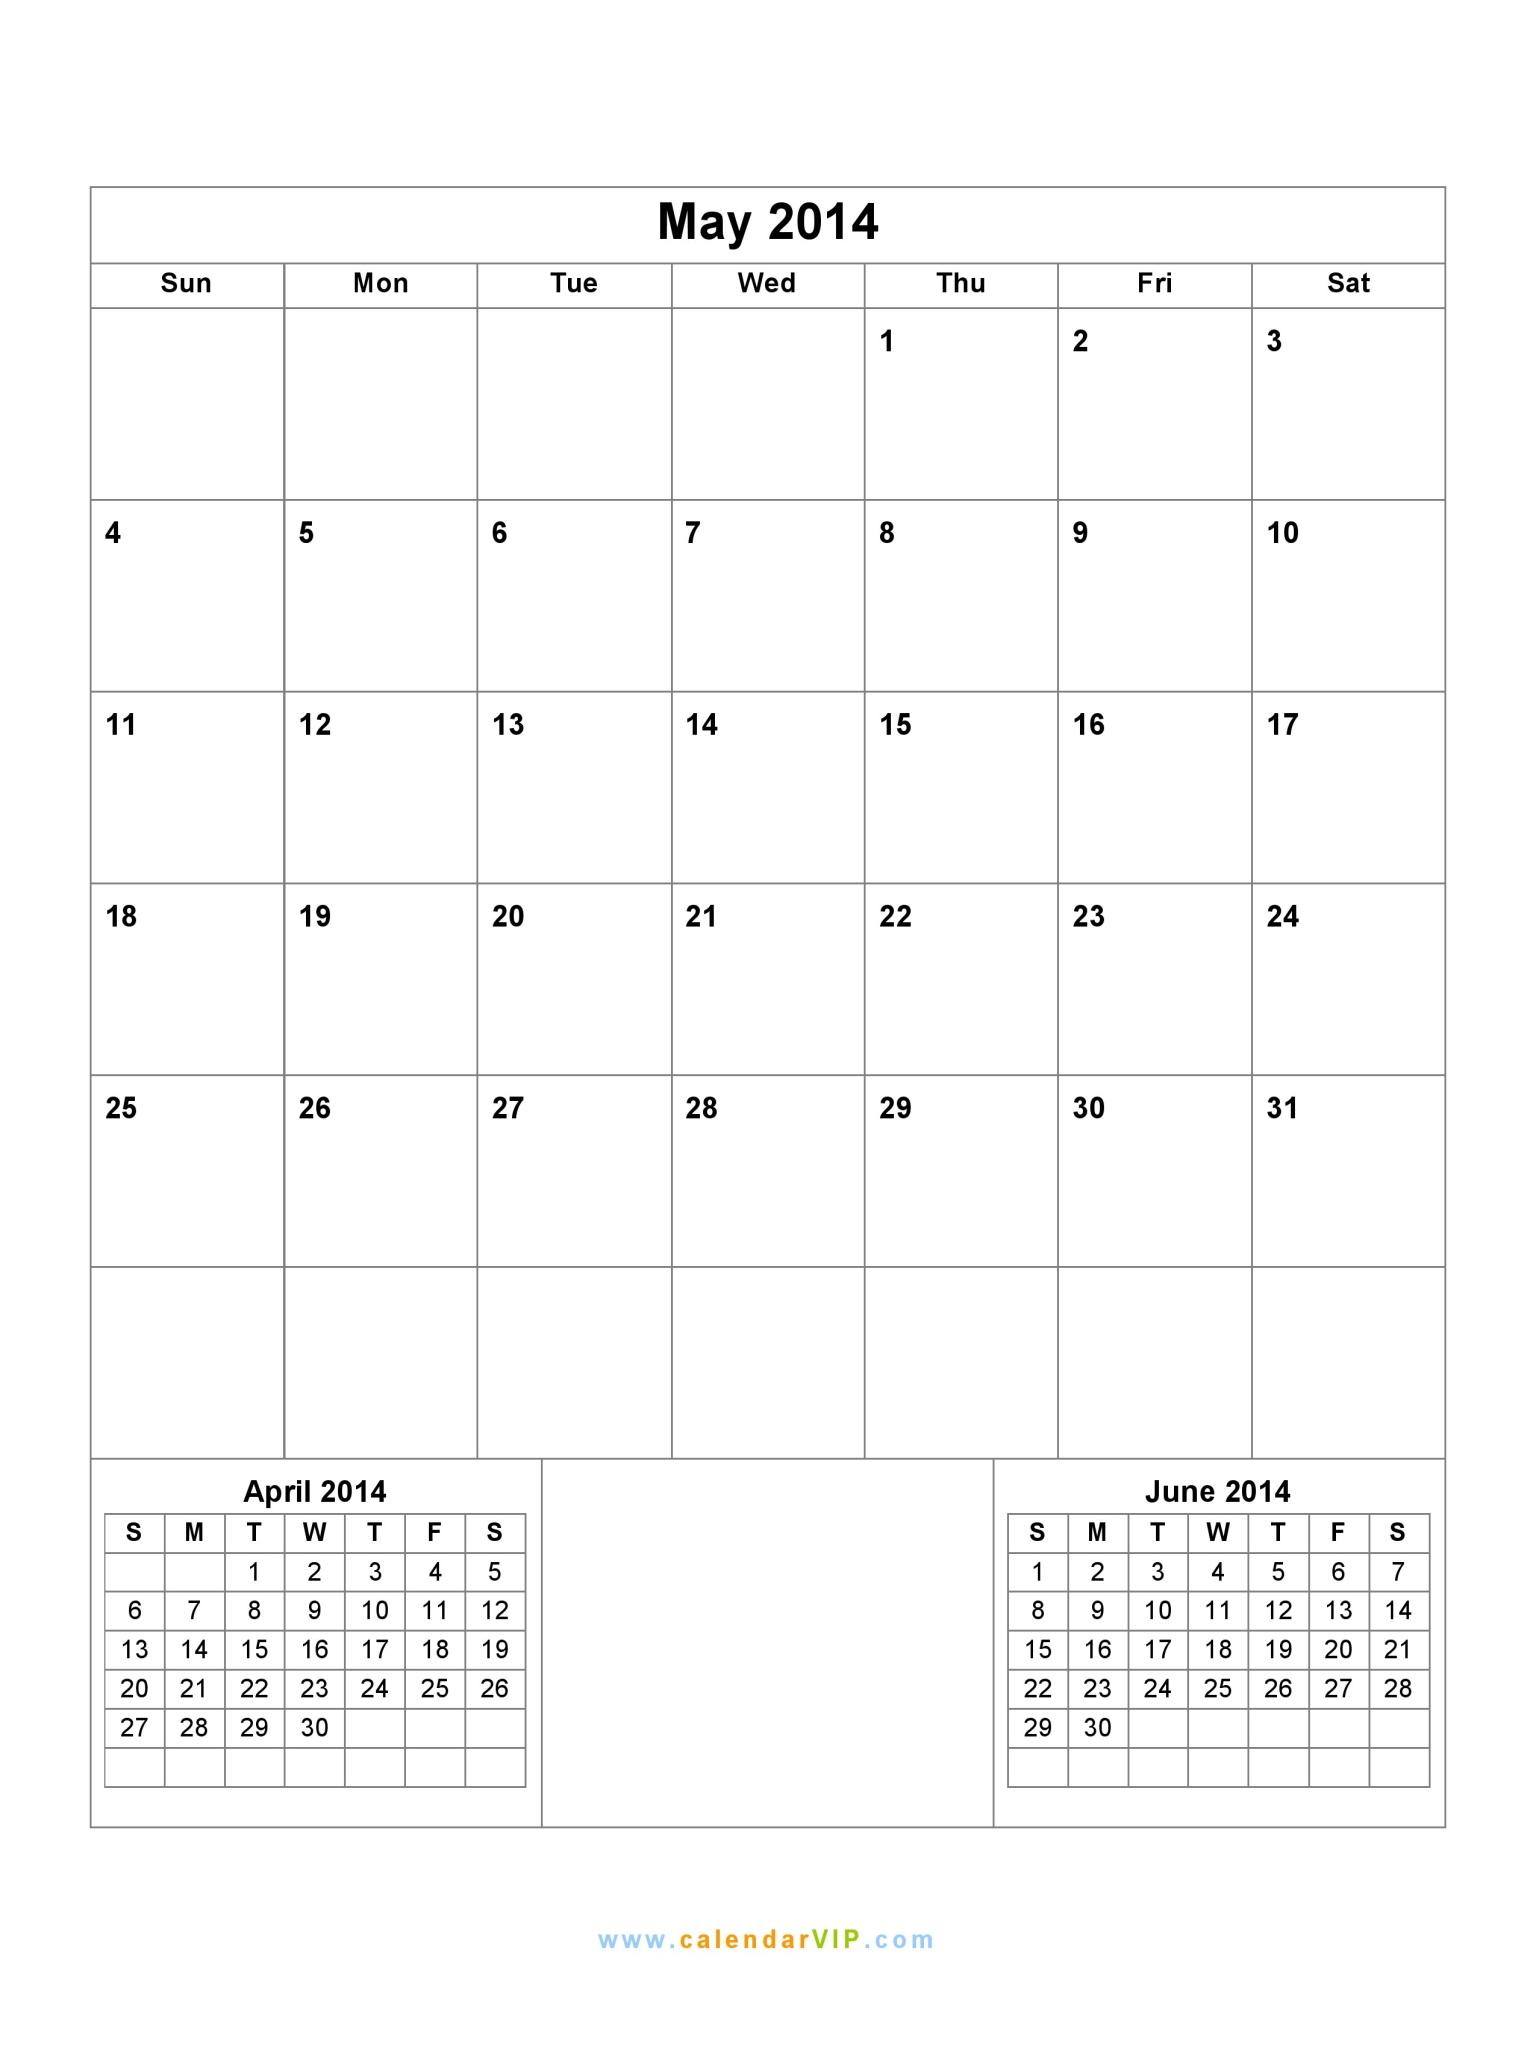 May 2014 calendar blank printable calendar template in pdf word excel may 2014 calendar saigontimesfo